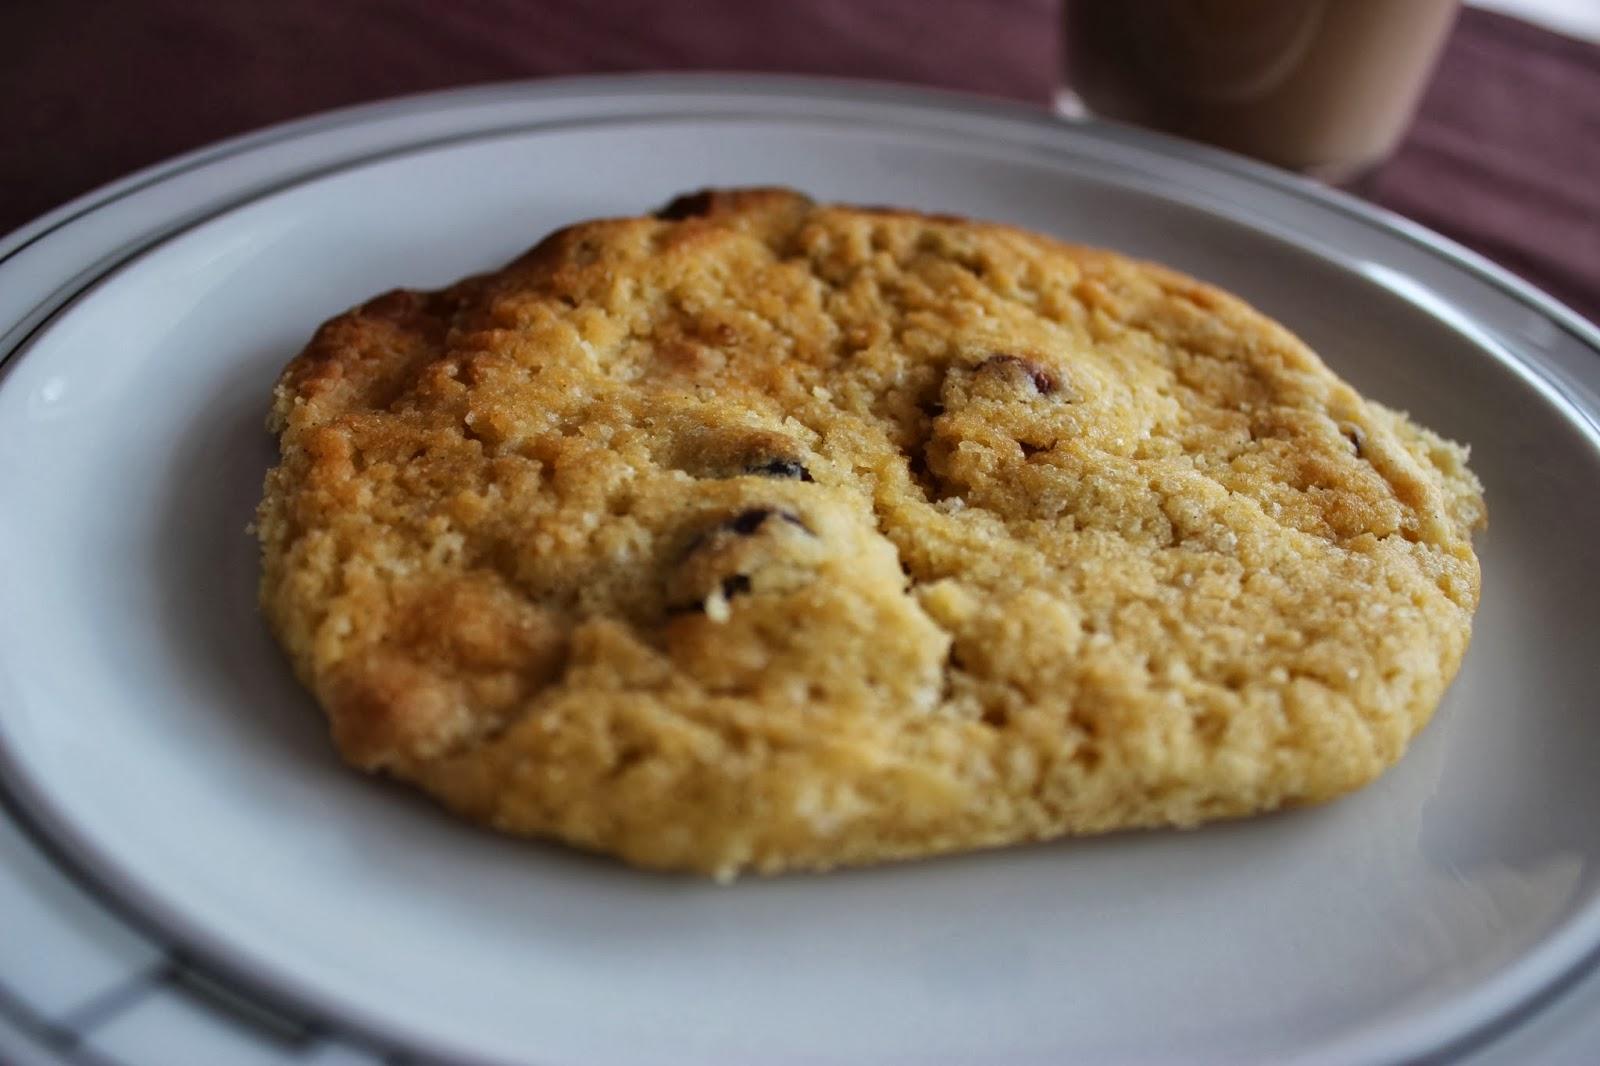 vegan kochen cookies white chocolate hazelnut cranberry. Black Bedroom Furniture Sets. Home Design Ideas